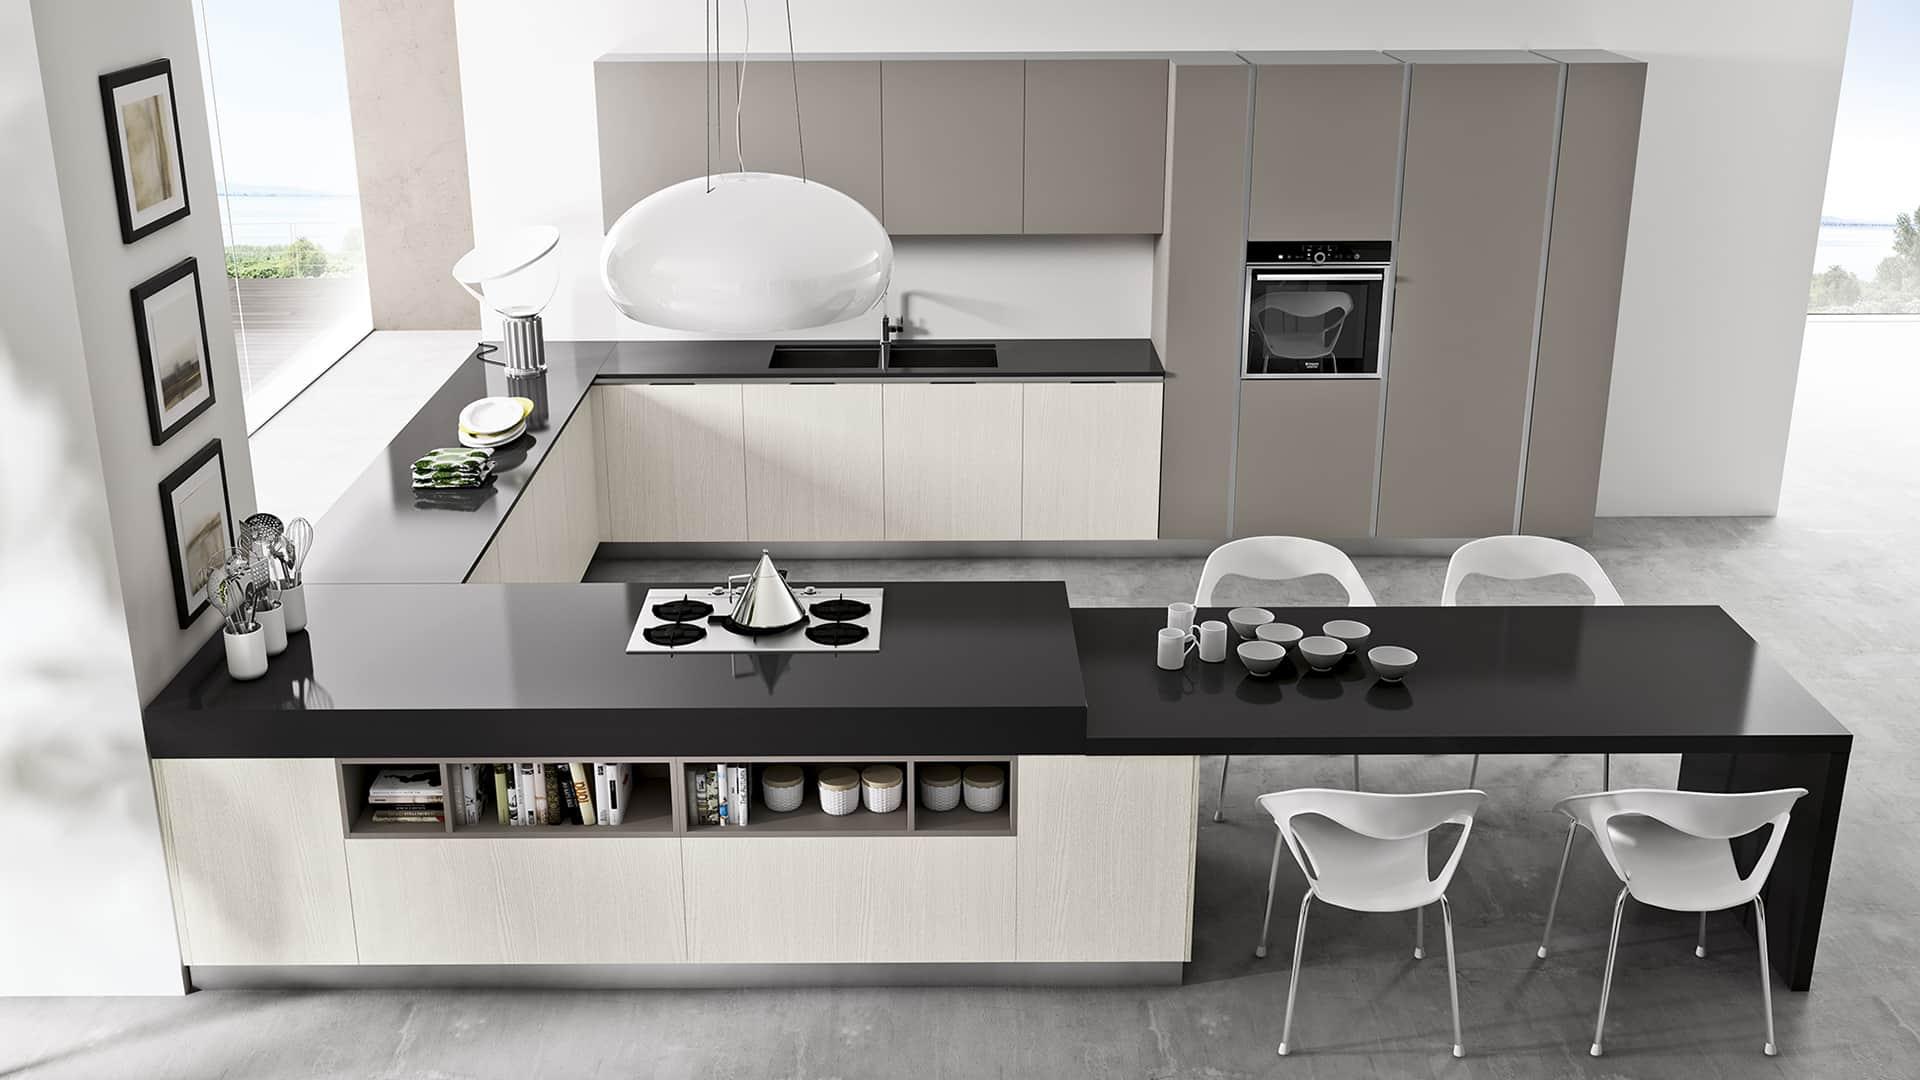 Cucine angolari moderne a padova - Design cucine moderne ...